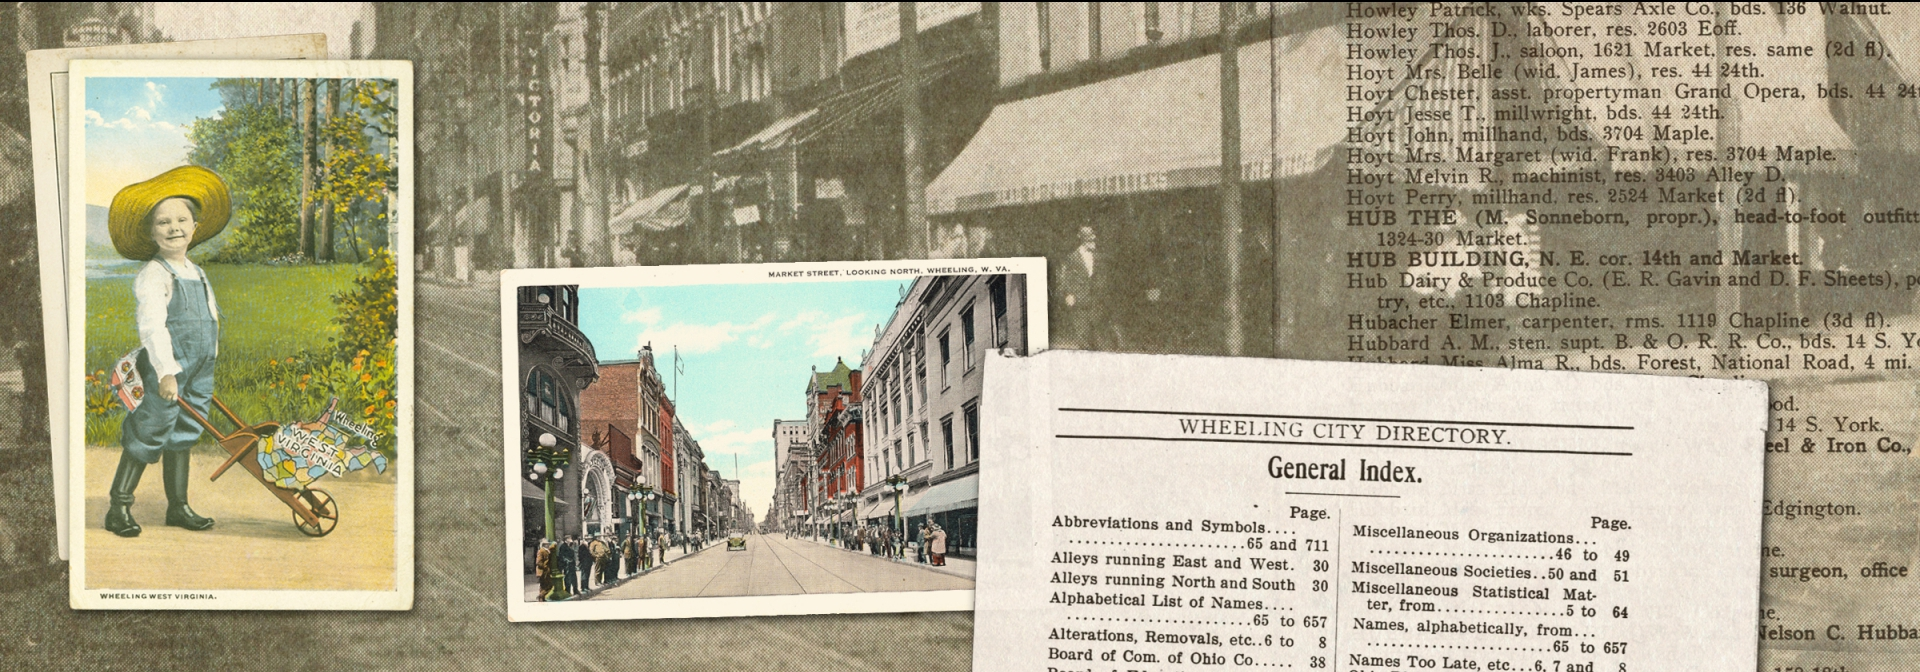 Ohio County Library | Ohio County WV | Wheeling WV History